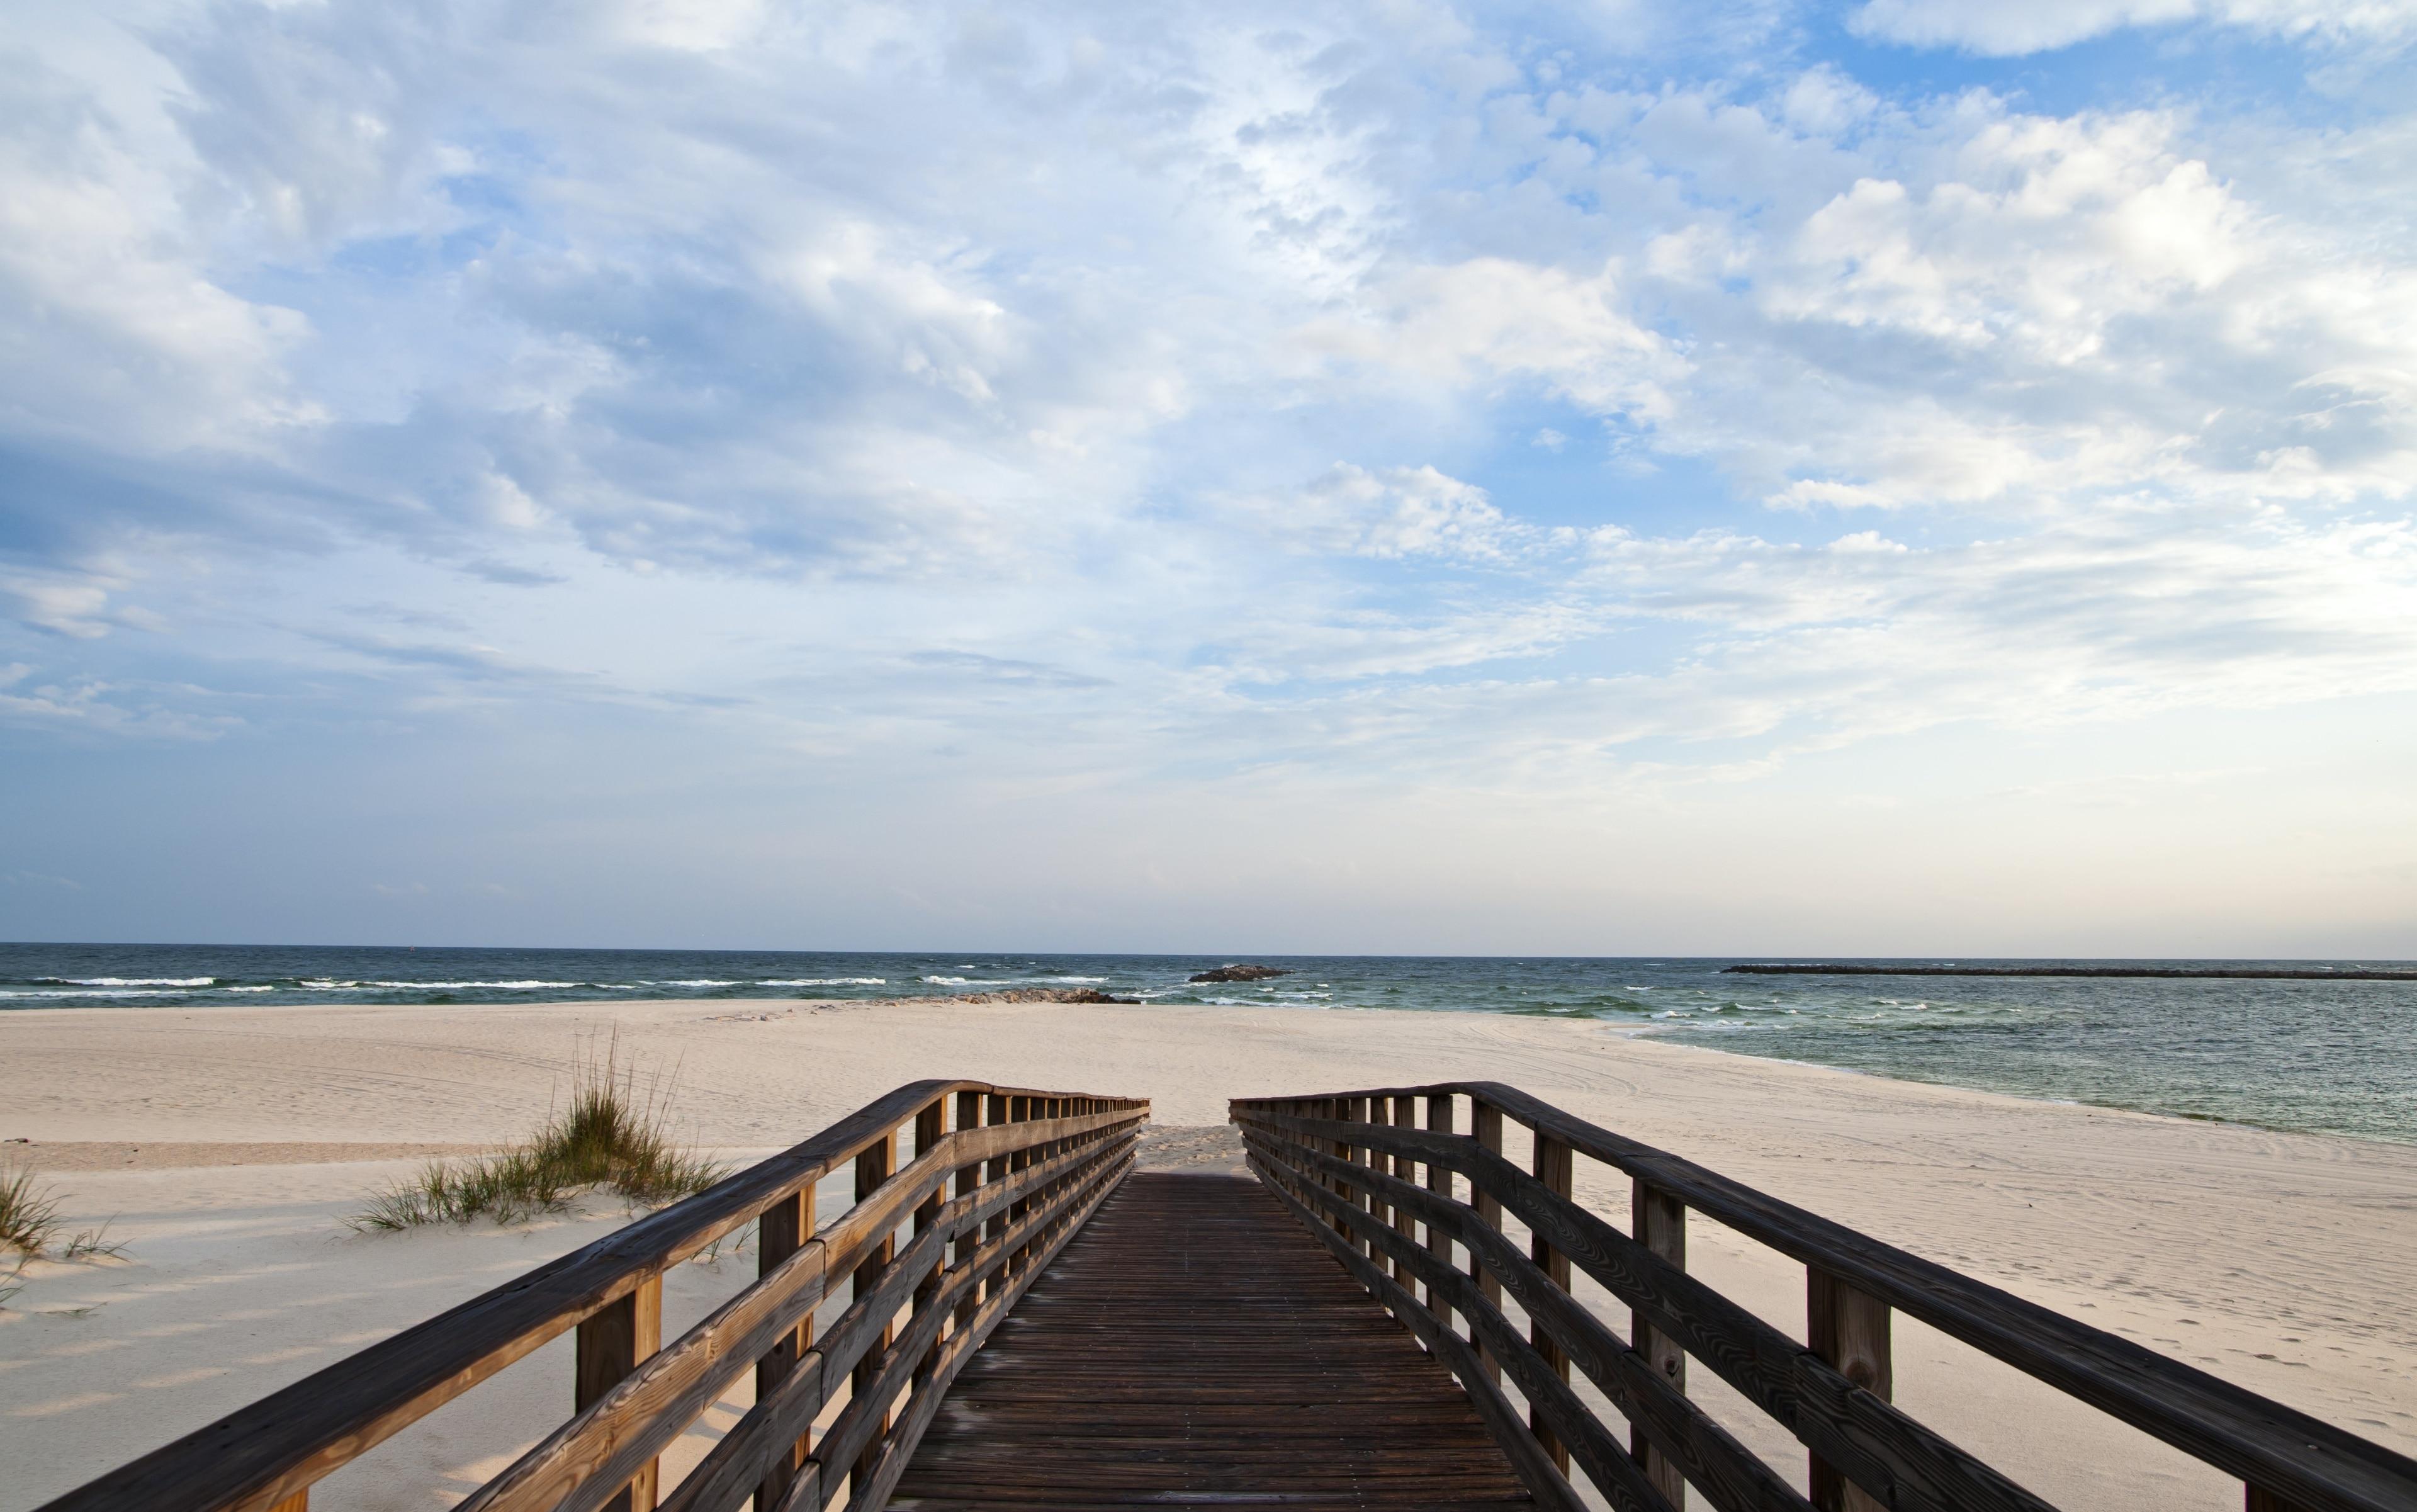 Perdido Beach, Alabama, United States of America